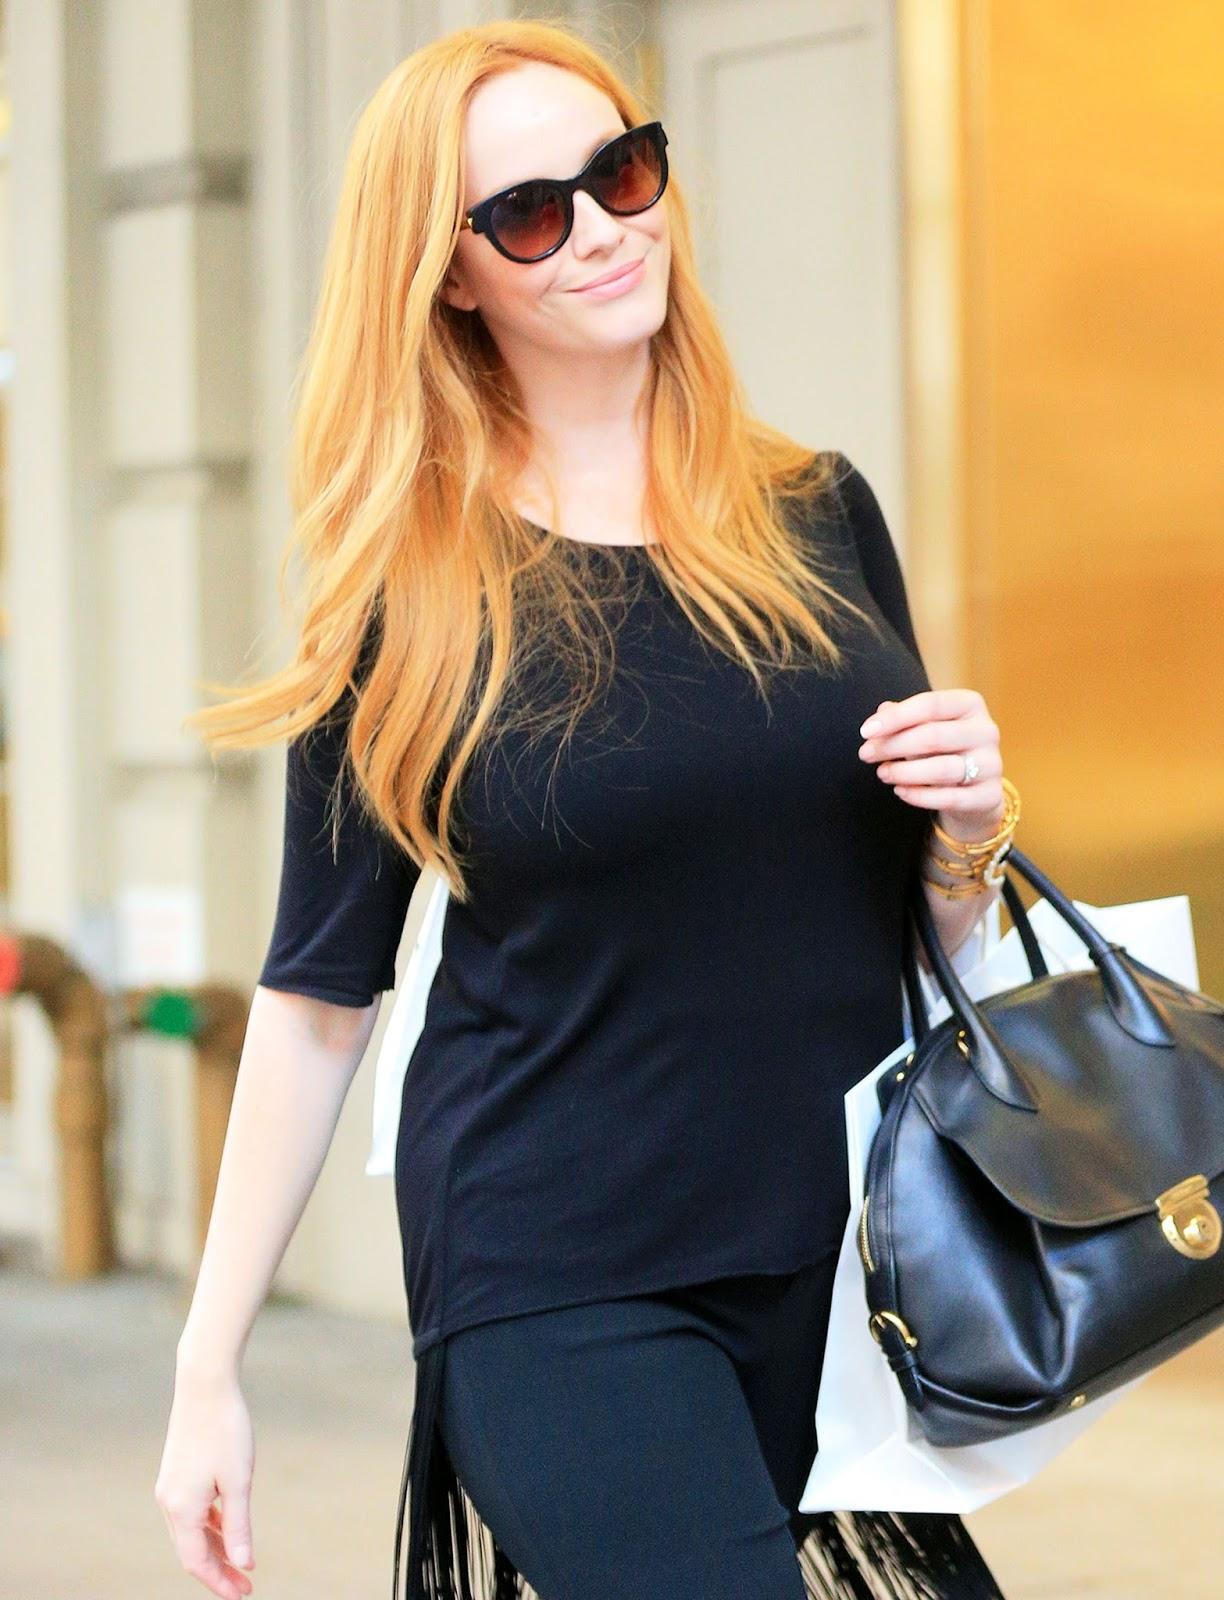 haykhota.com: Actress @ Christina Hendricks - out shopping